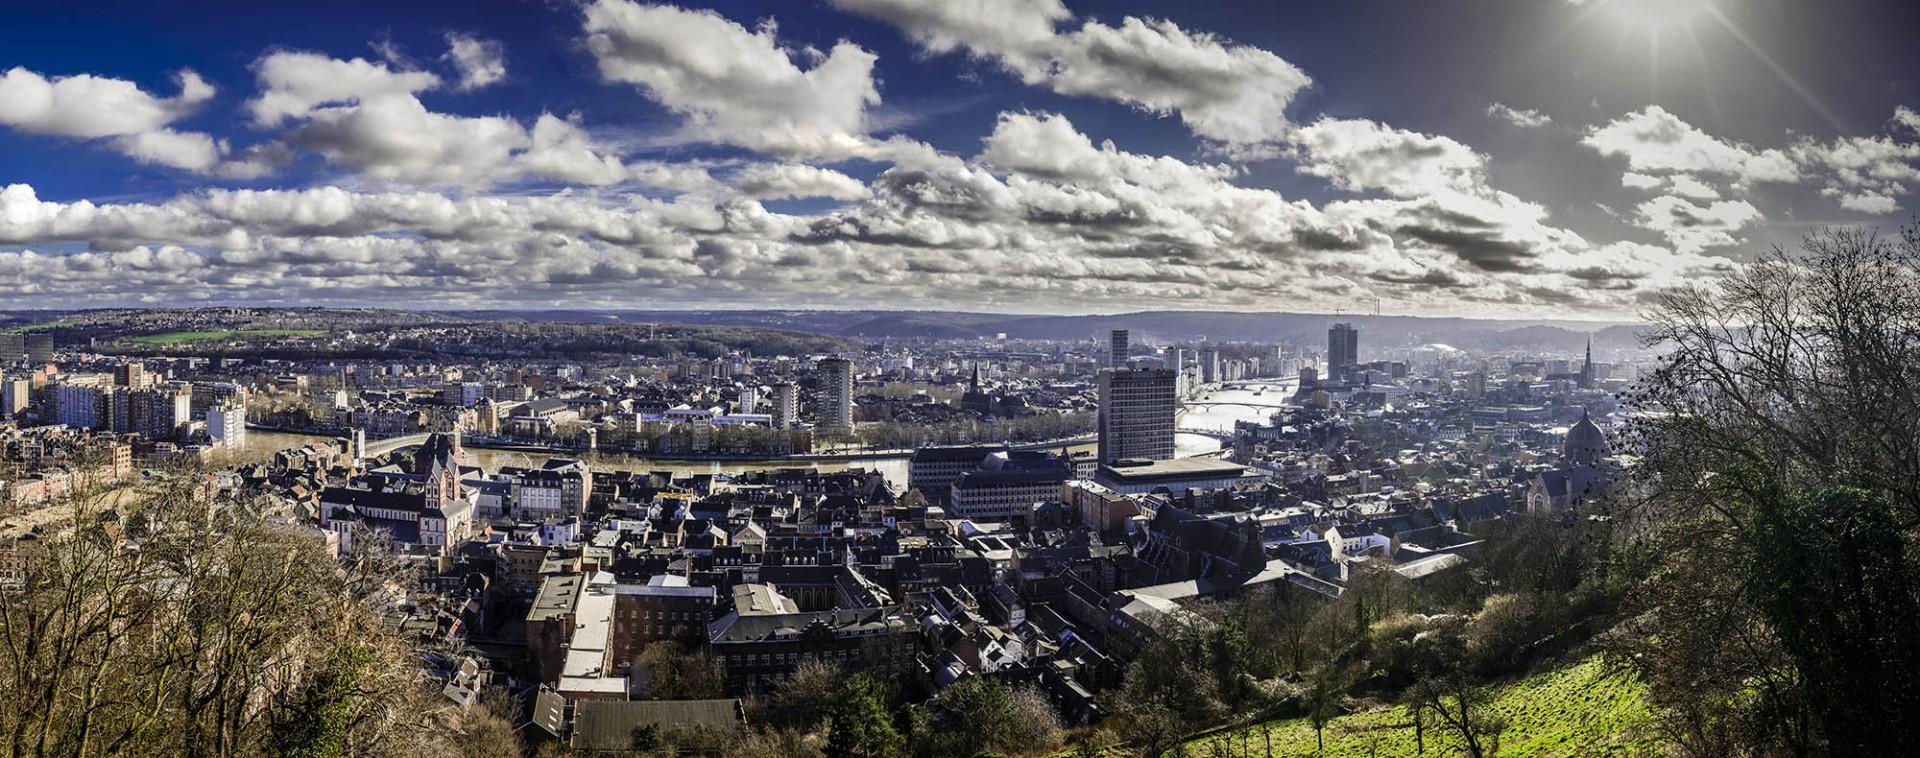 Pays de Liège | © FTPL-Jean-Marc Léonard